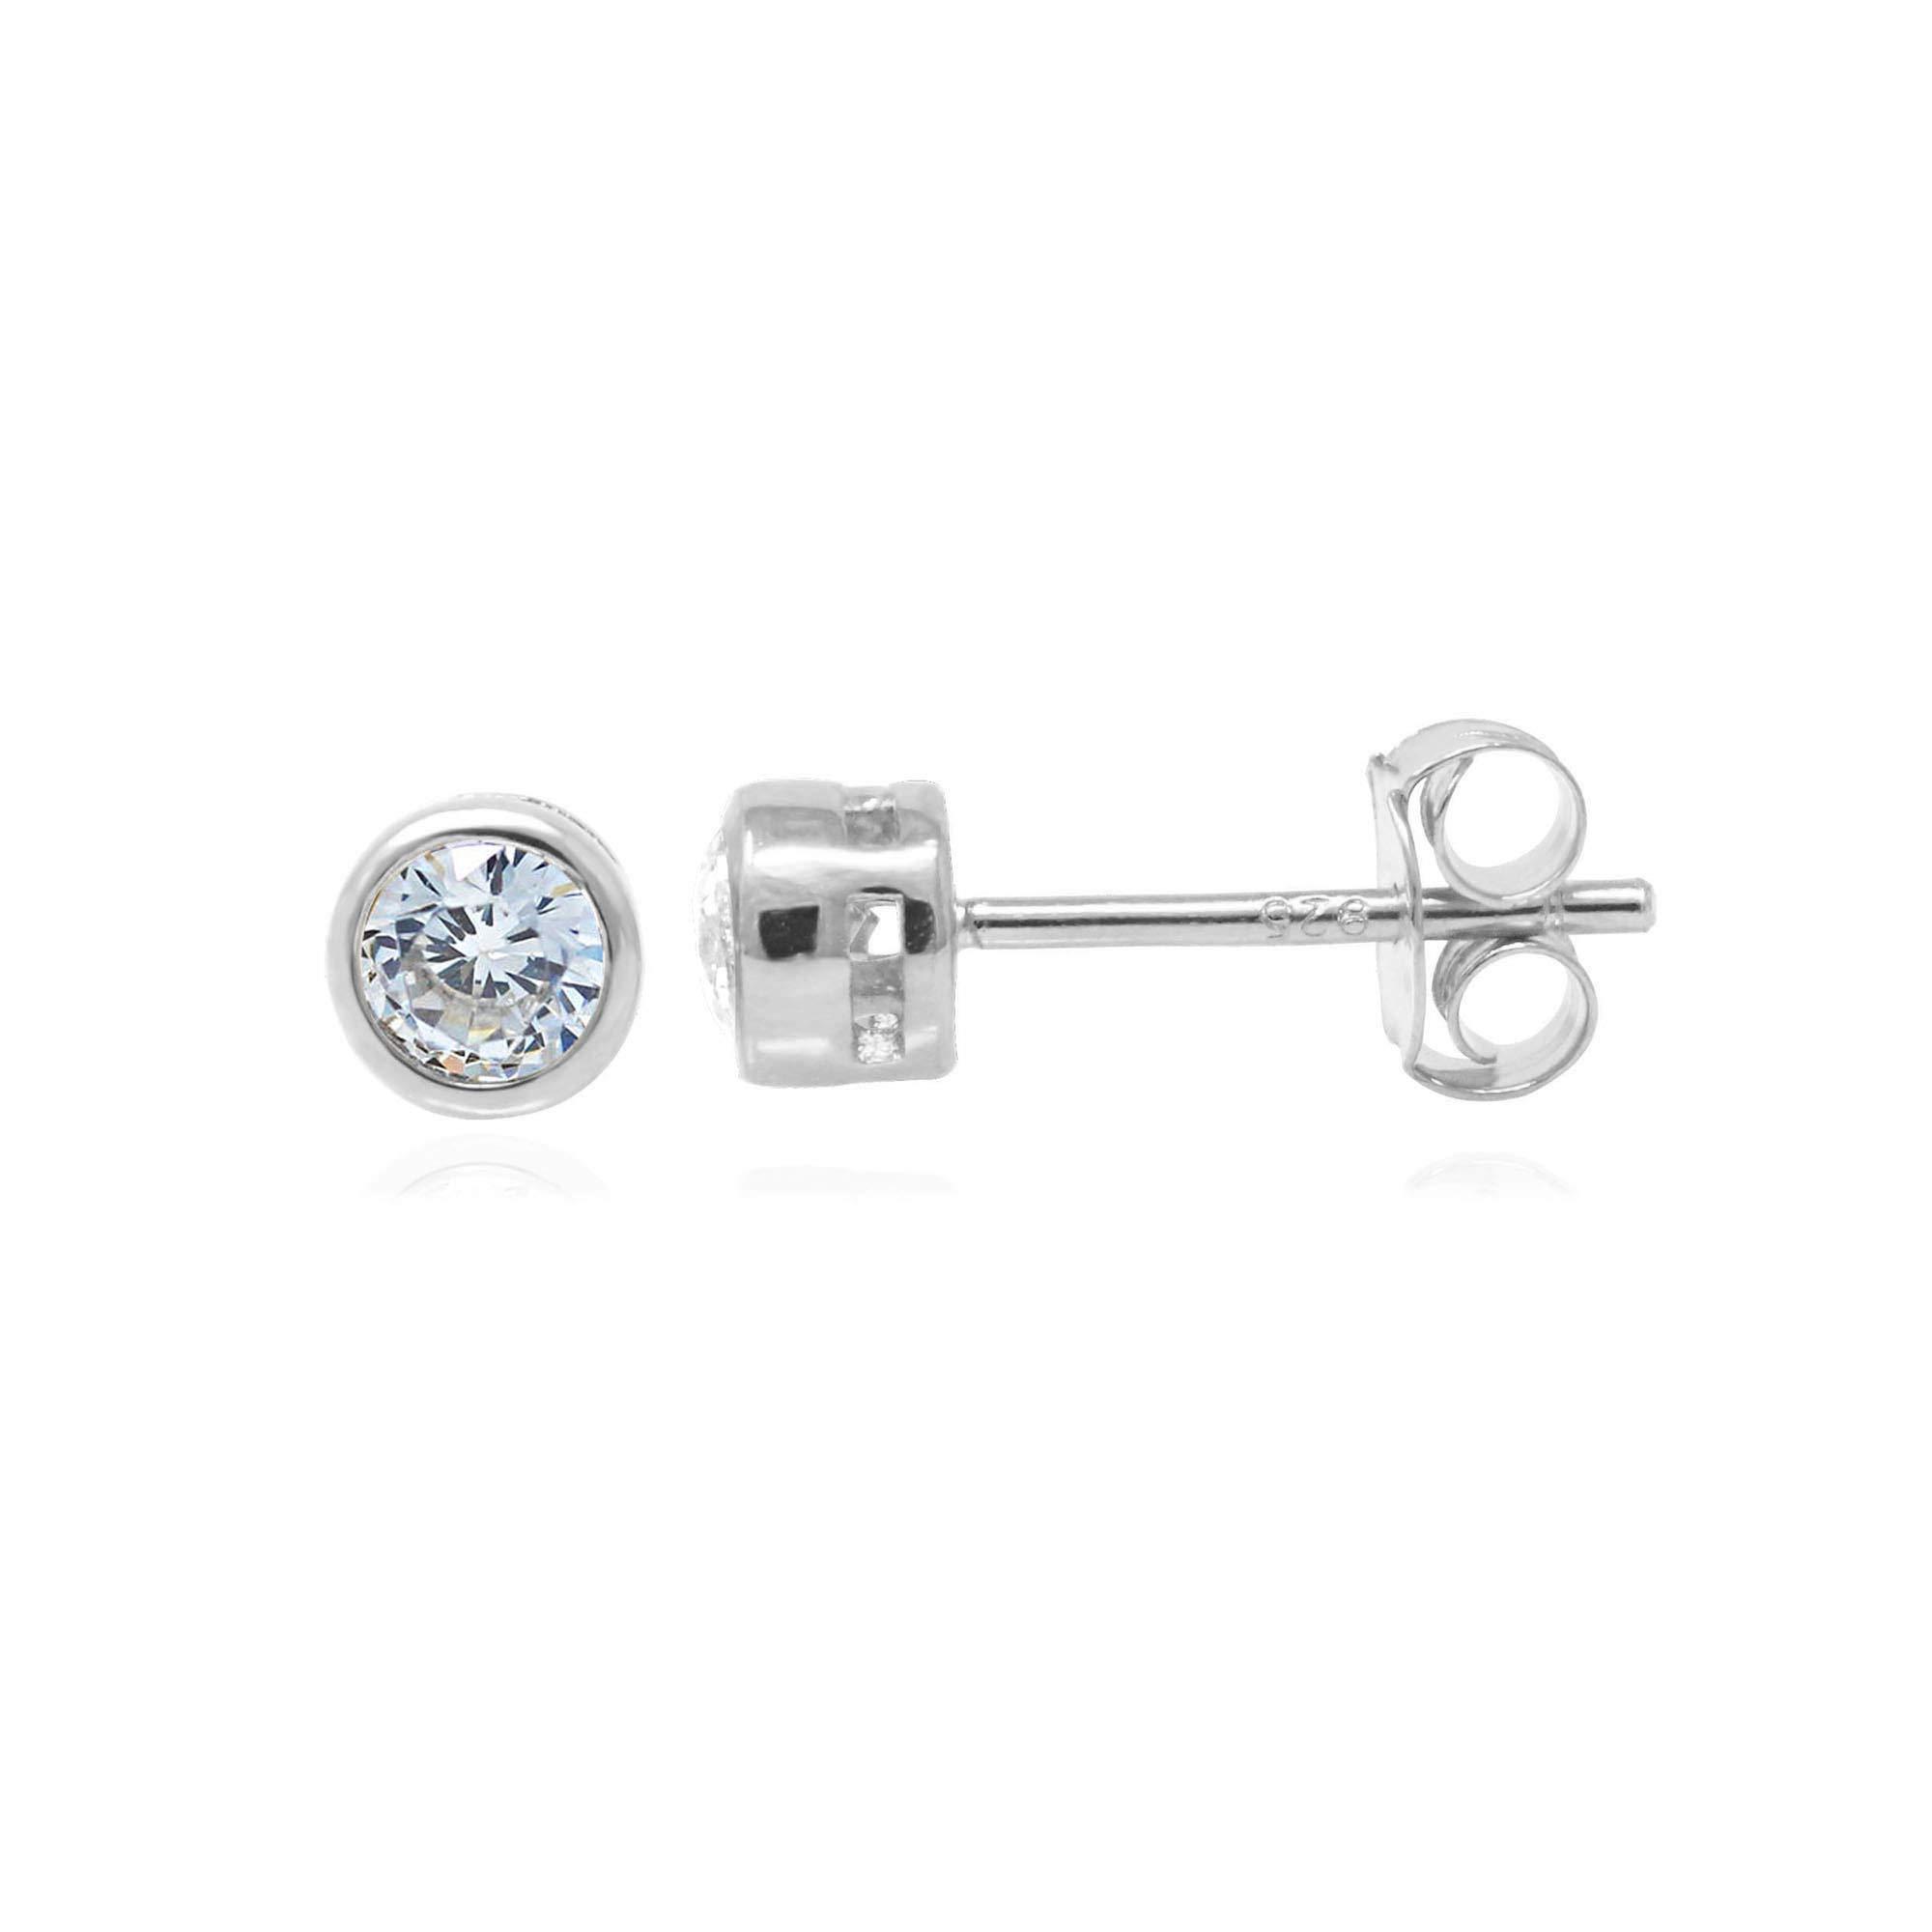 Rhdoiumd Plated Sterling Silver Bezel Set Cubic Zirconia Stud Earrings, 3mm stone